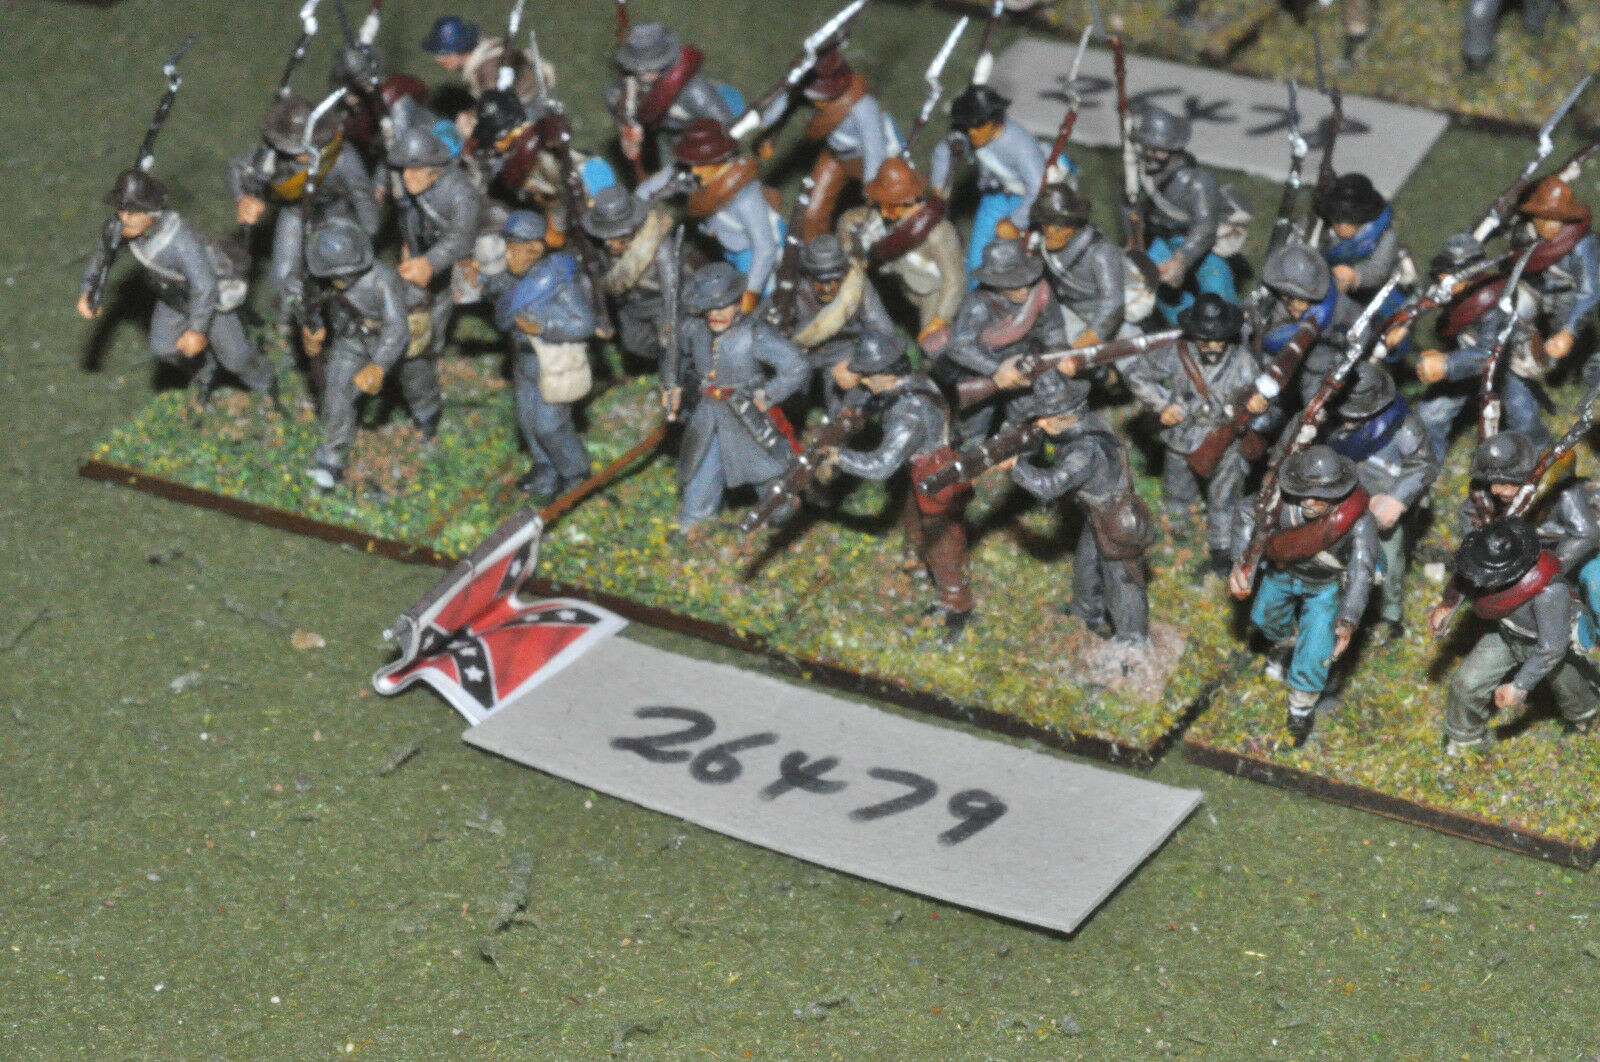 25mm ACW   confederate - regt. (plastic) 32 figures - inf (26479)